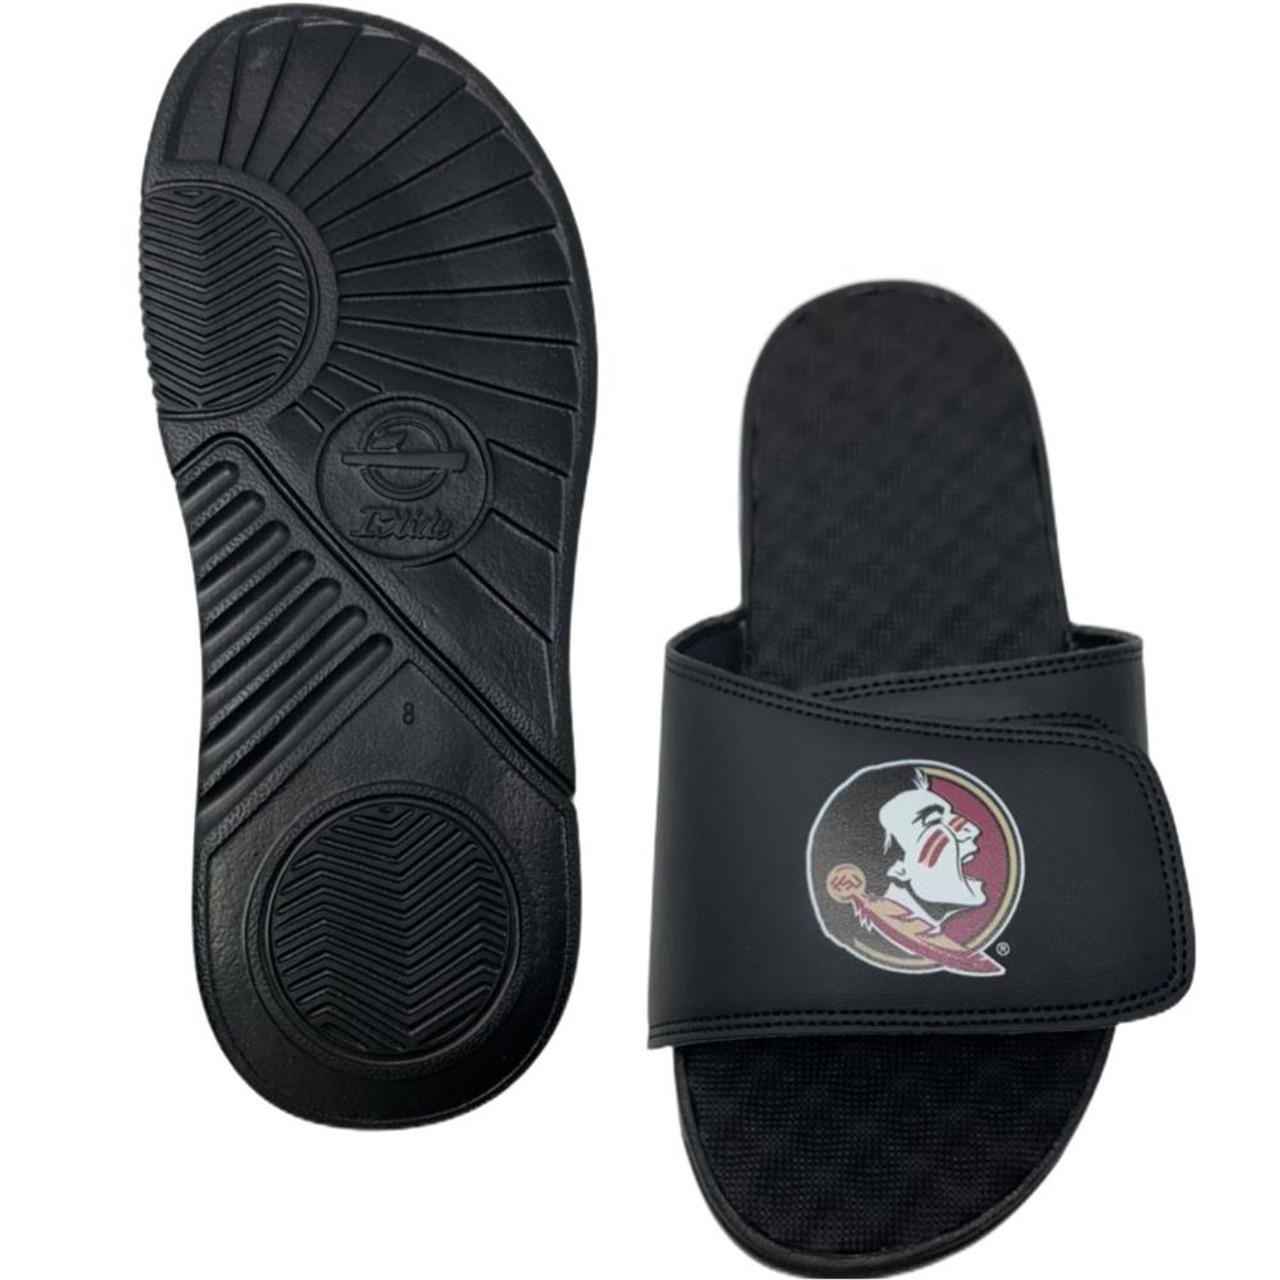 University of Iowa Hawkeyes Slides ISlide Primary Adjustable Sandals